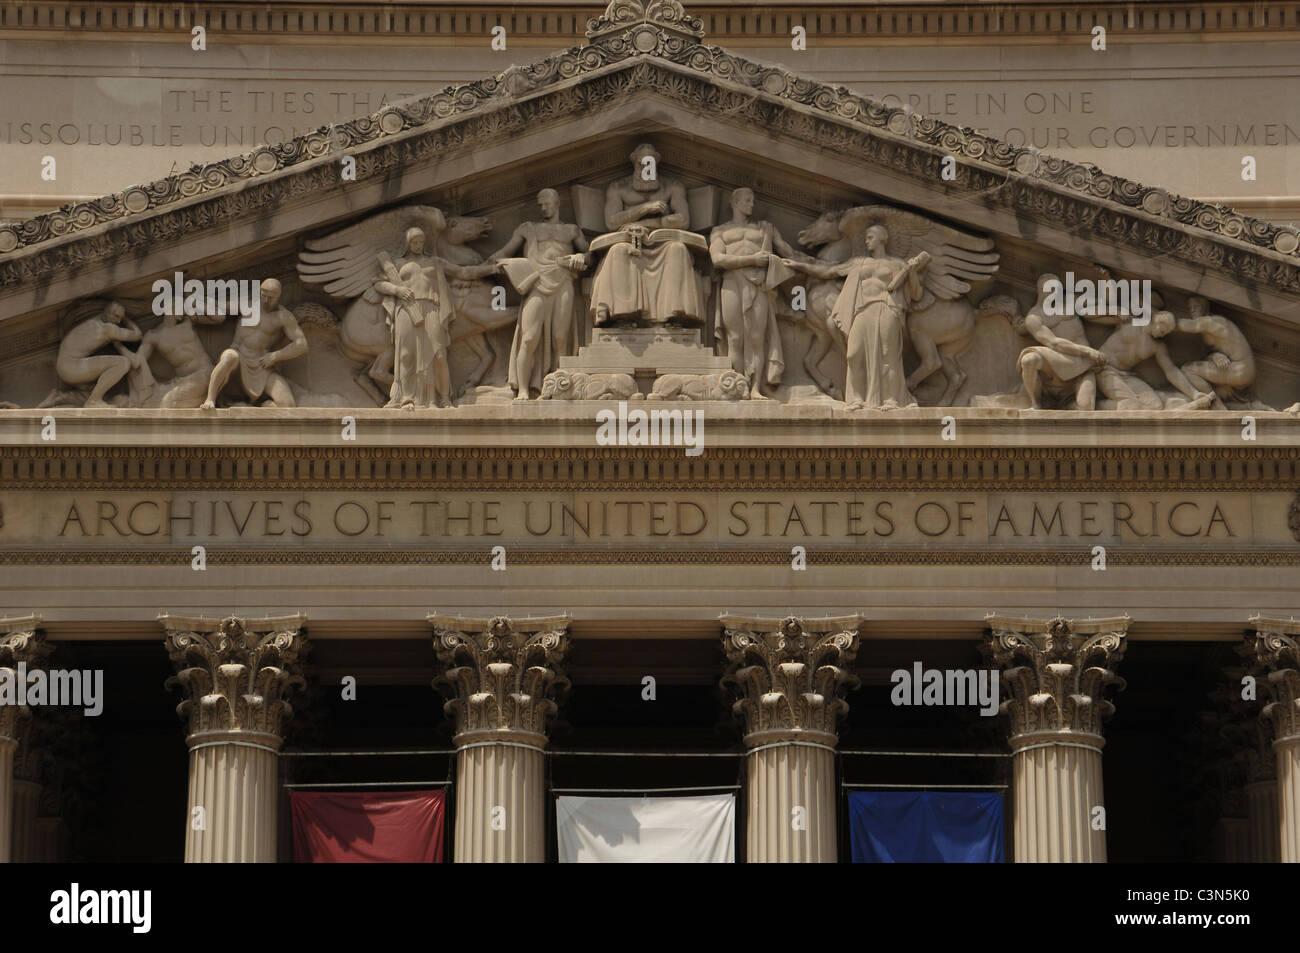 National Archives Building. Exterior. Washington D.C. United States. - Stock Image